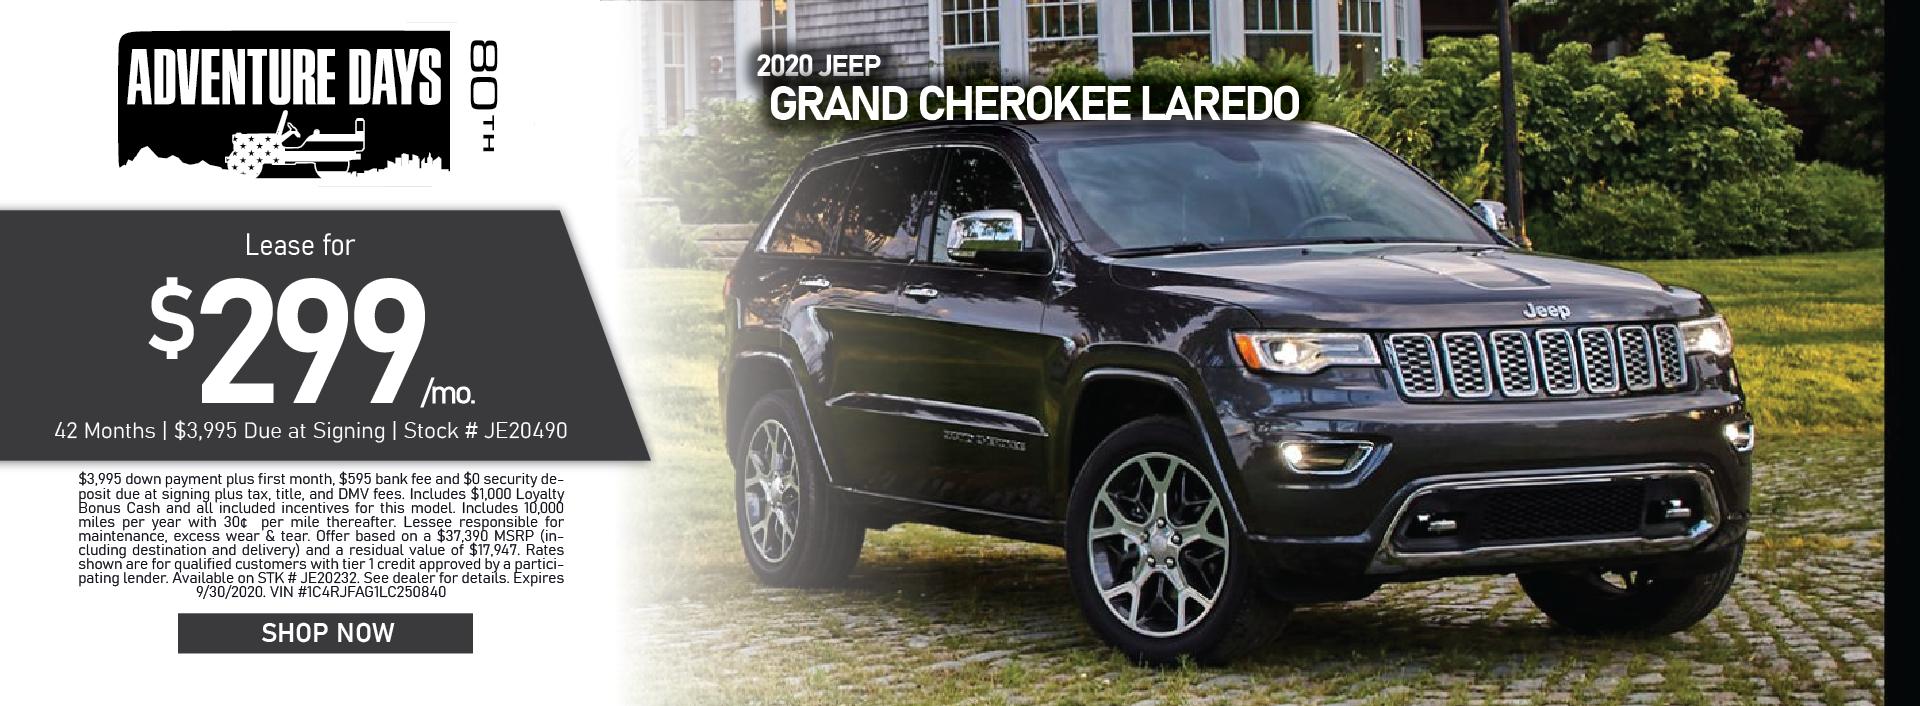 Grand Cherokee-edit-SEPT2020